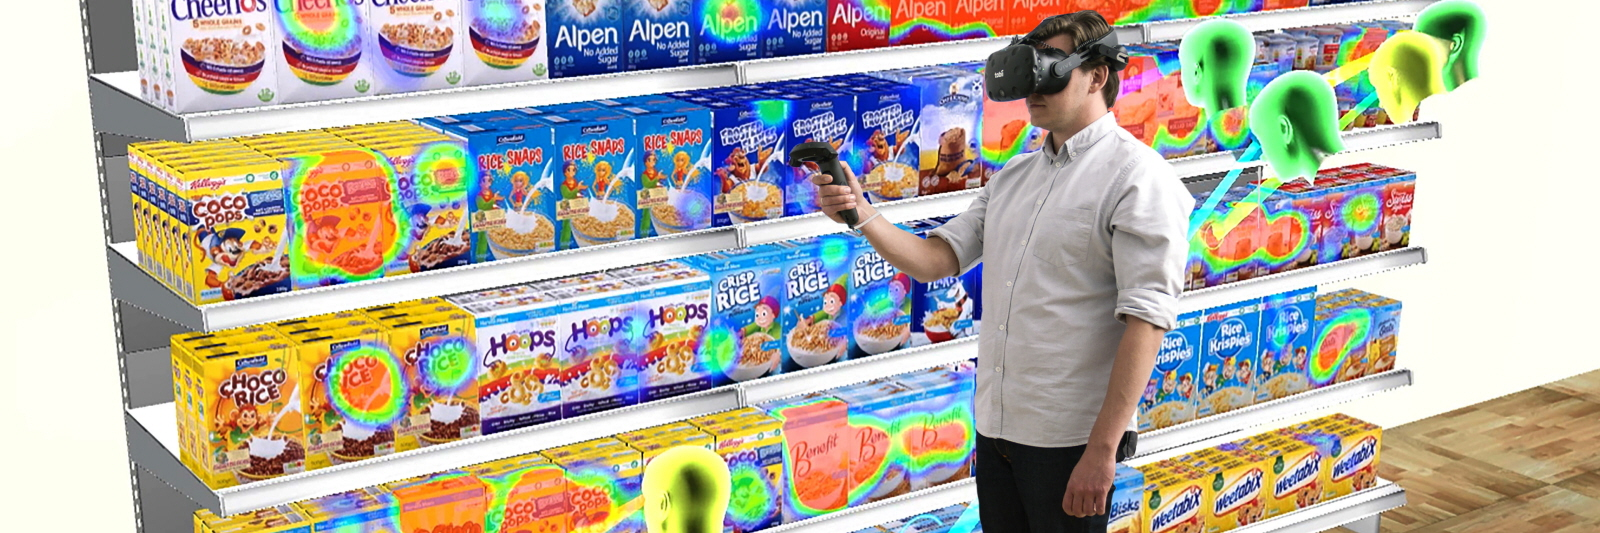 VR eye tracking supermarket headset